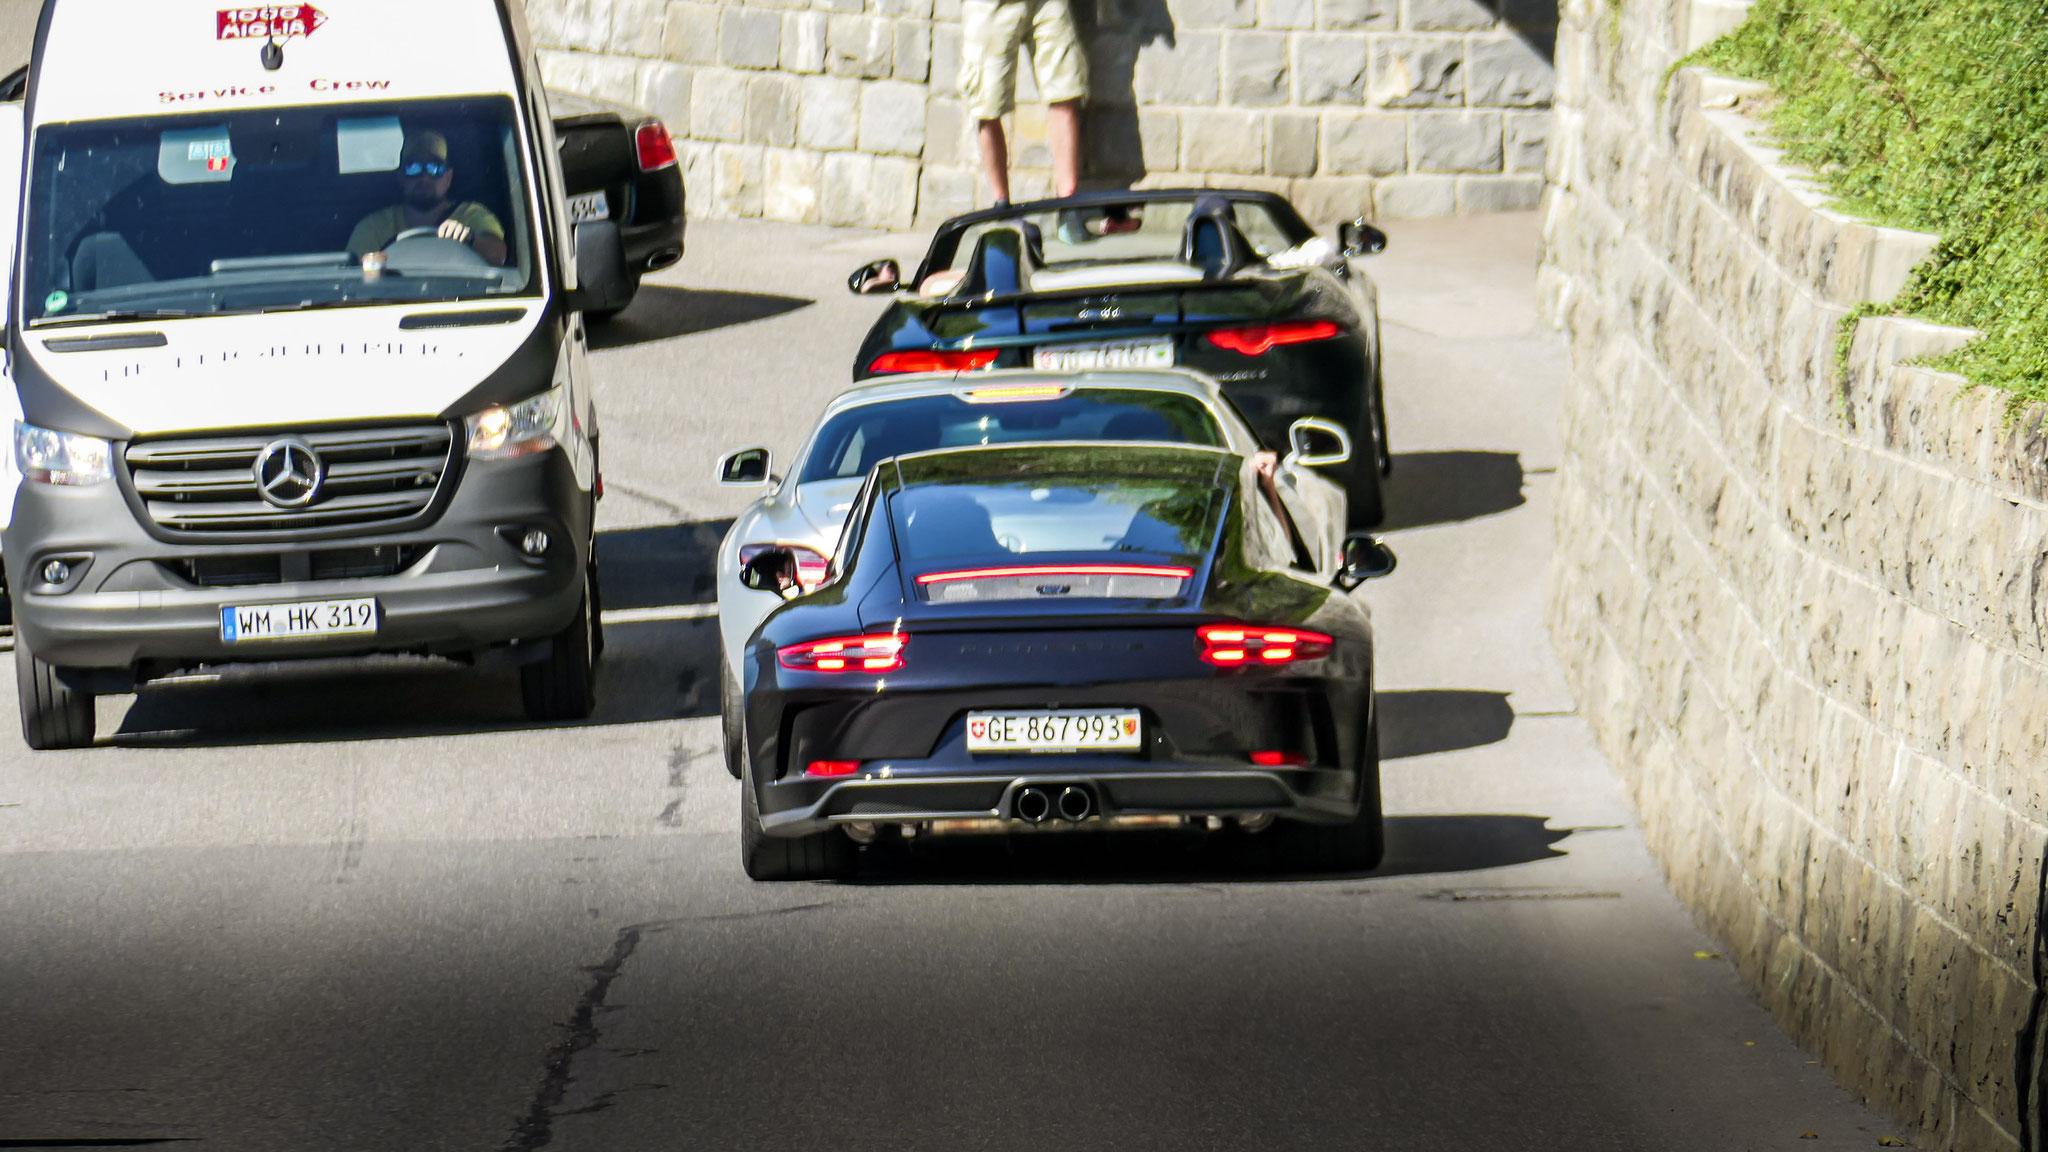 Porsche 991 GT3 Touring Package - GE-867993 (CH)